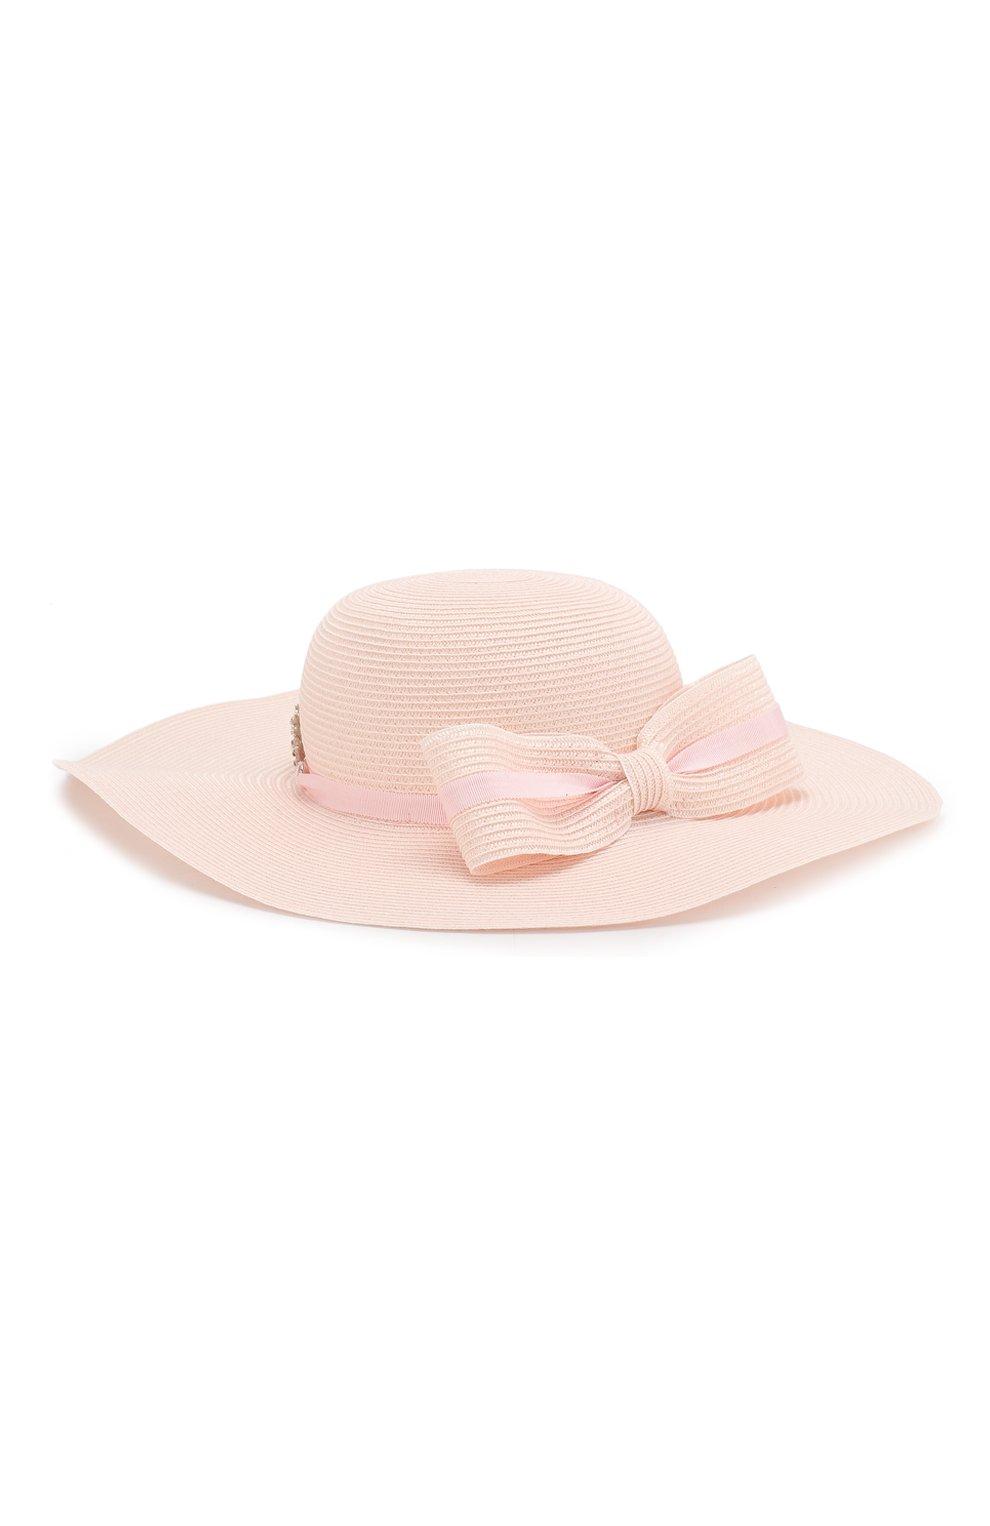 Шляпа с декором | Фото №2